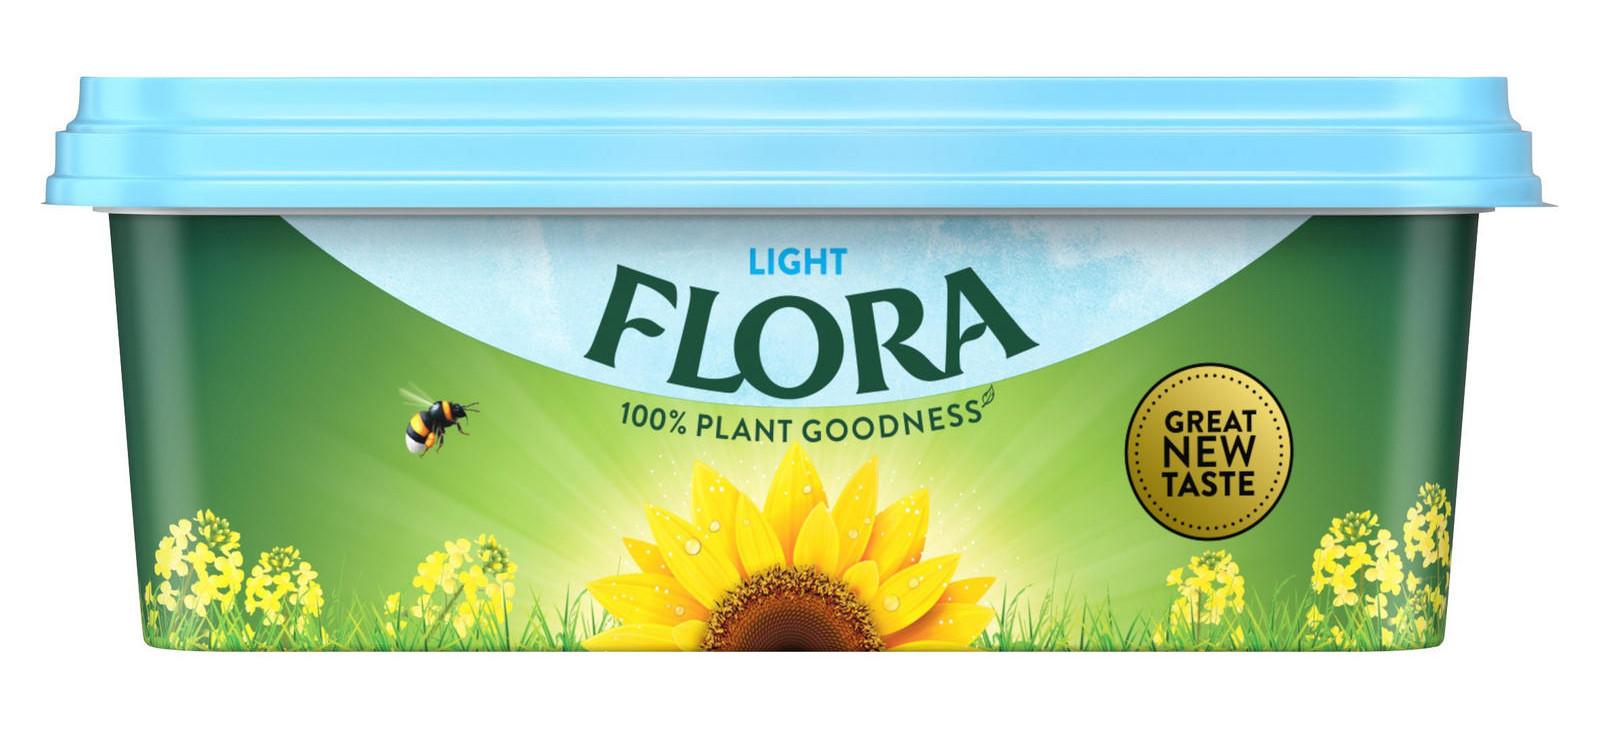 Flora Light Spread 250g - 50p @ Iceland